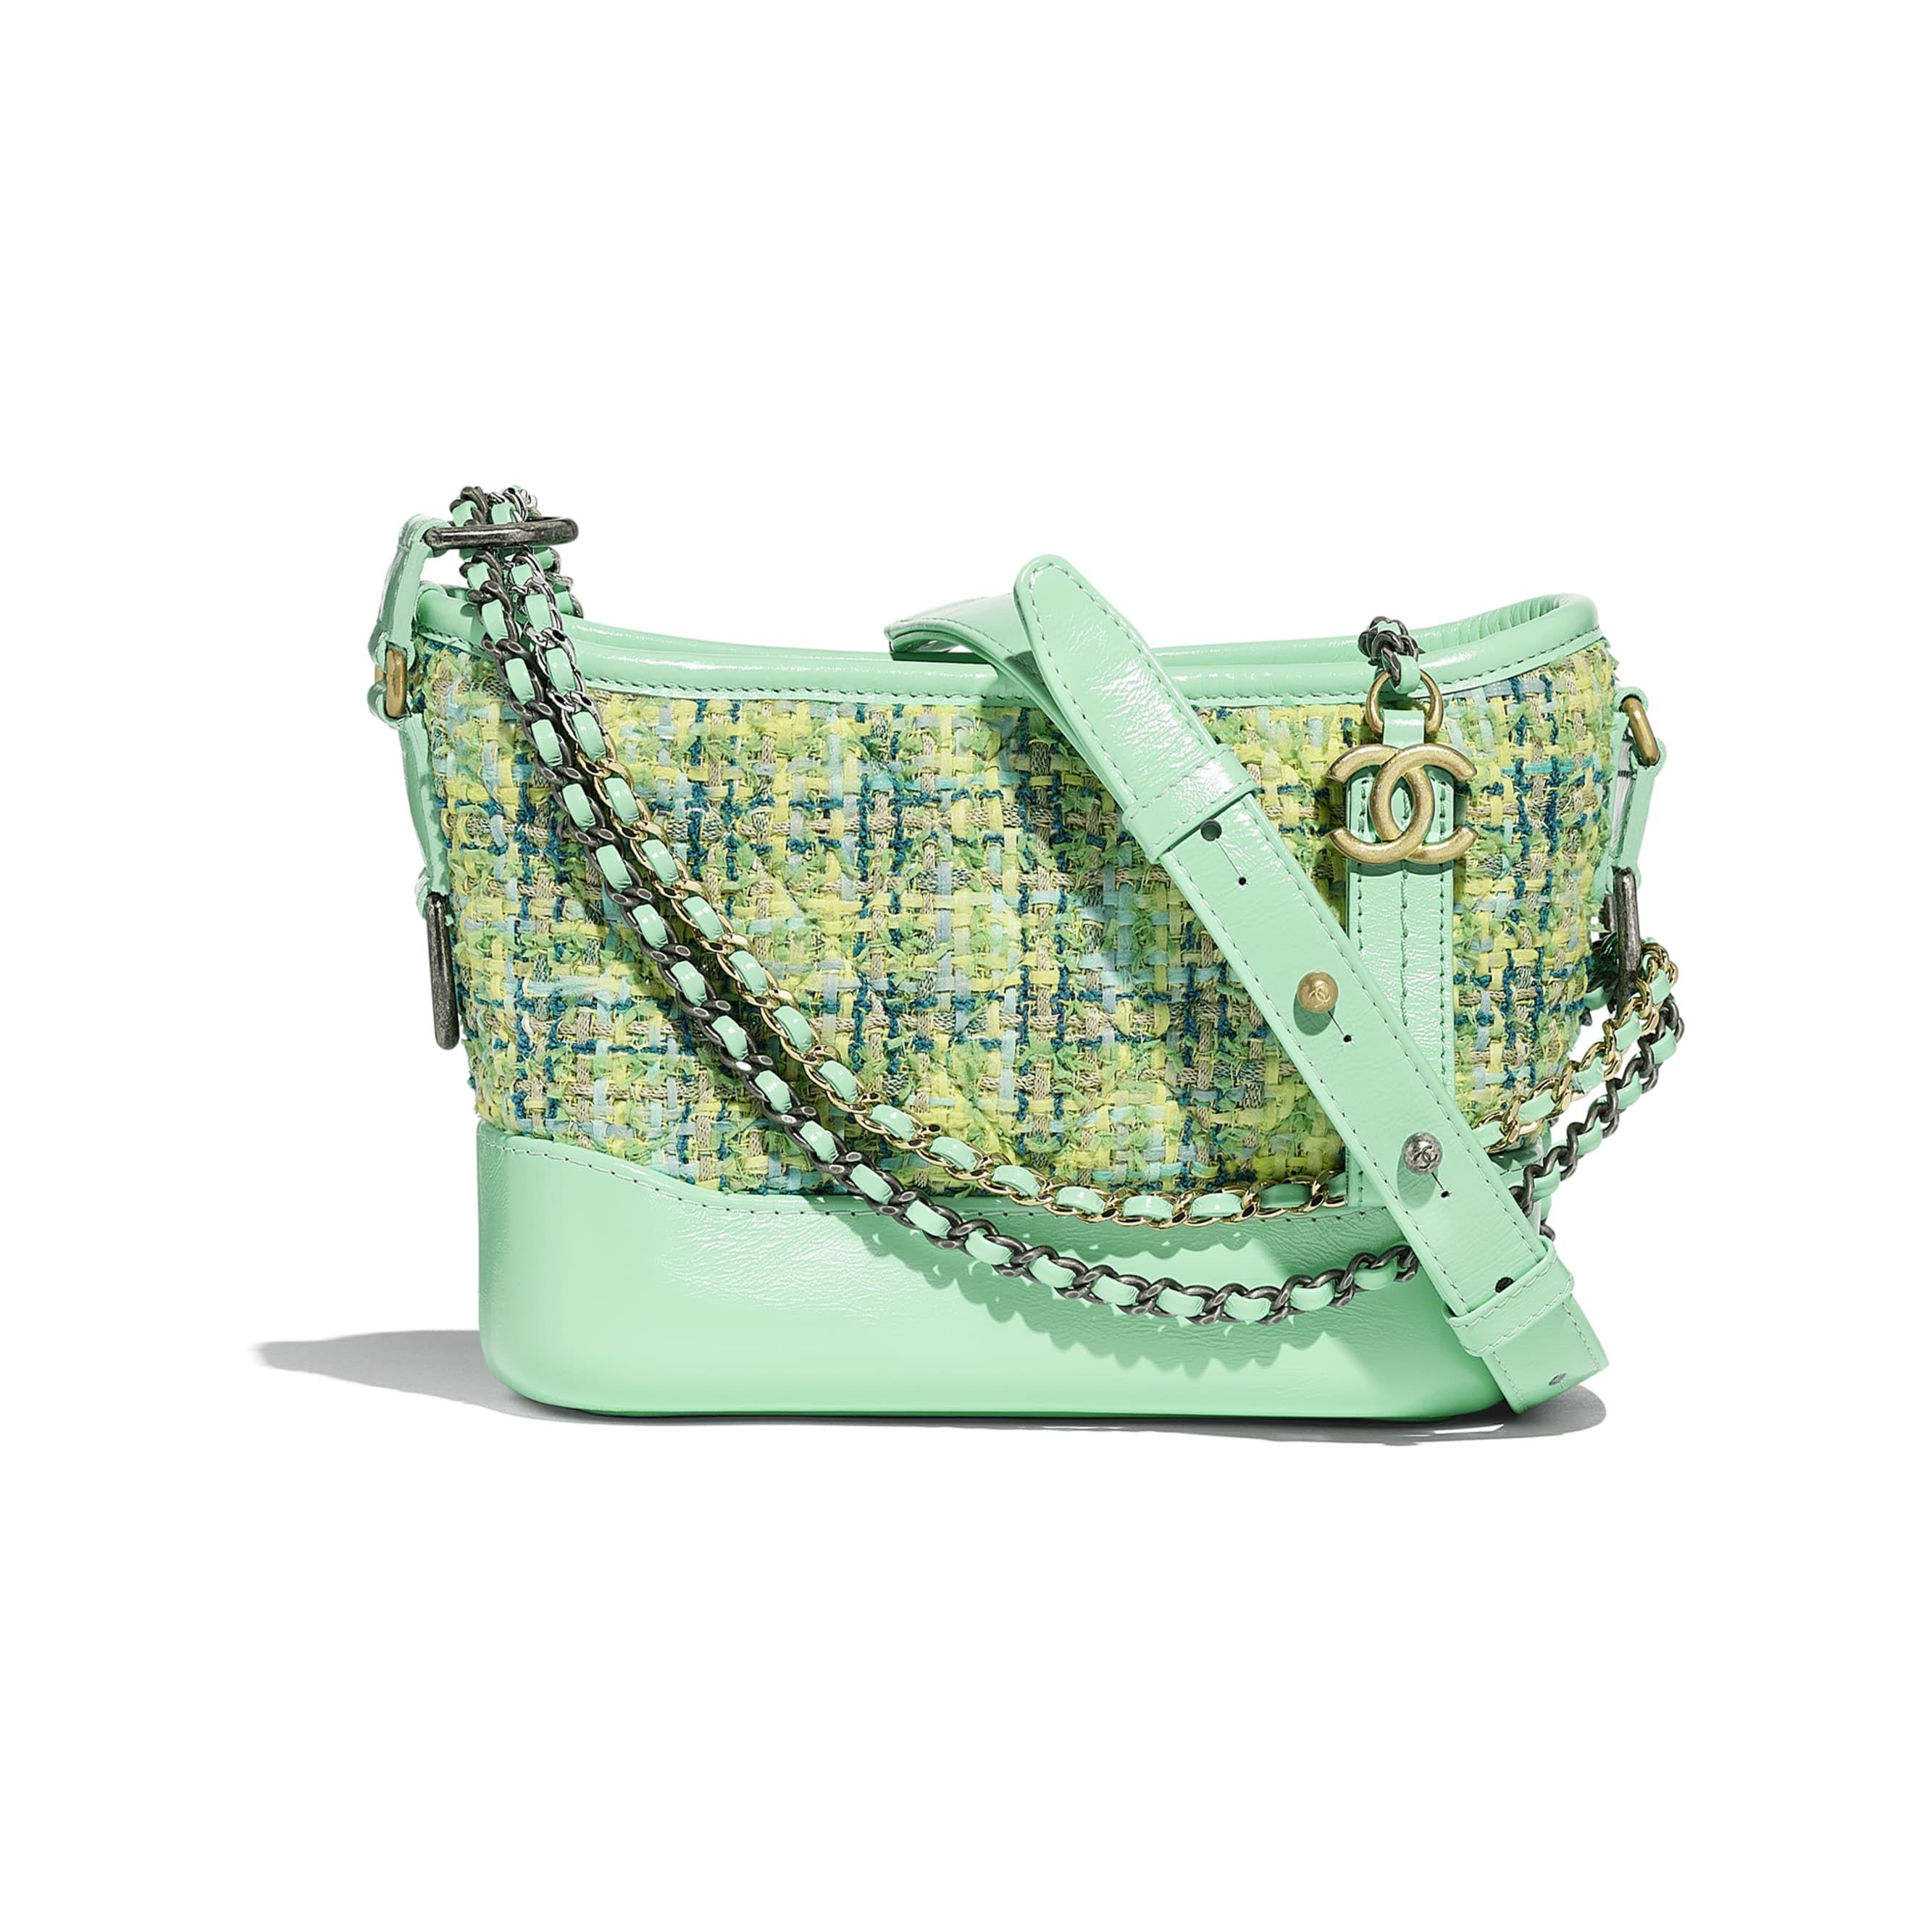 d7a93383d3 Chanel - PRE SS2019 | Green tweed, calfskin gold-tone & silver-